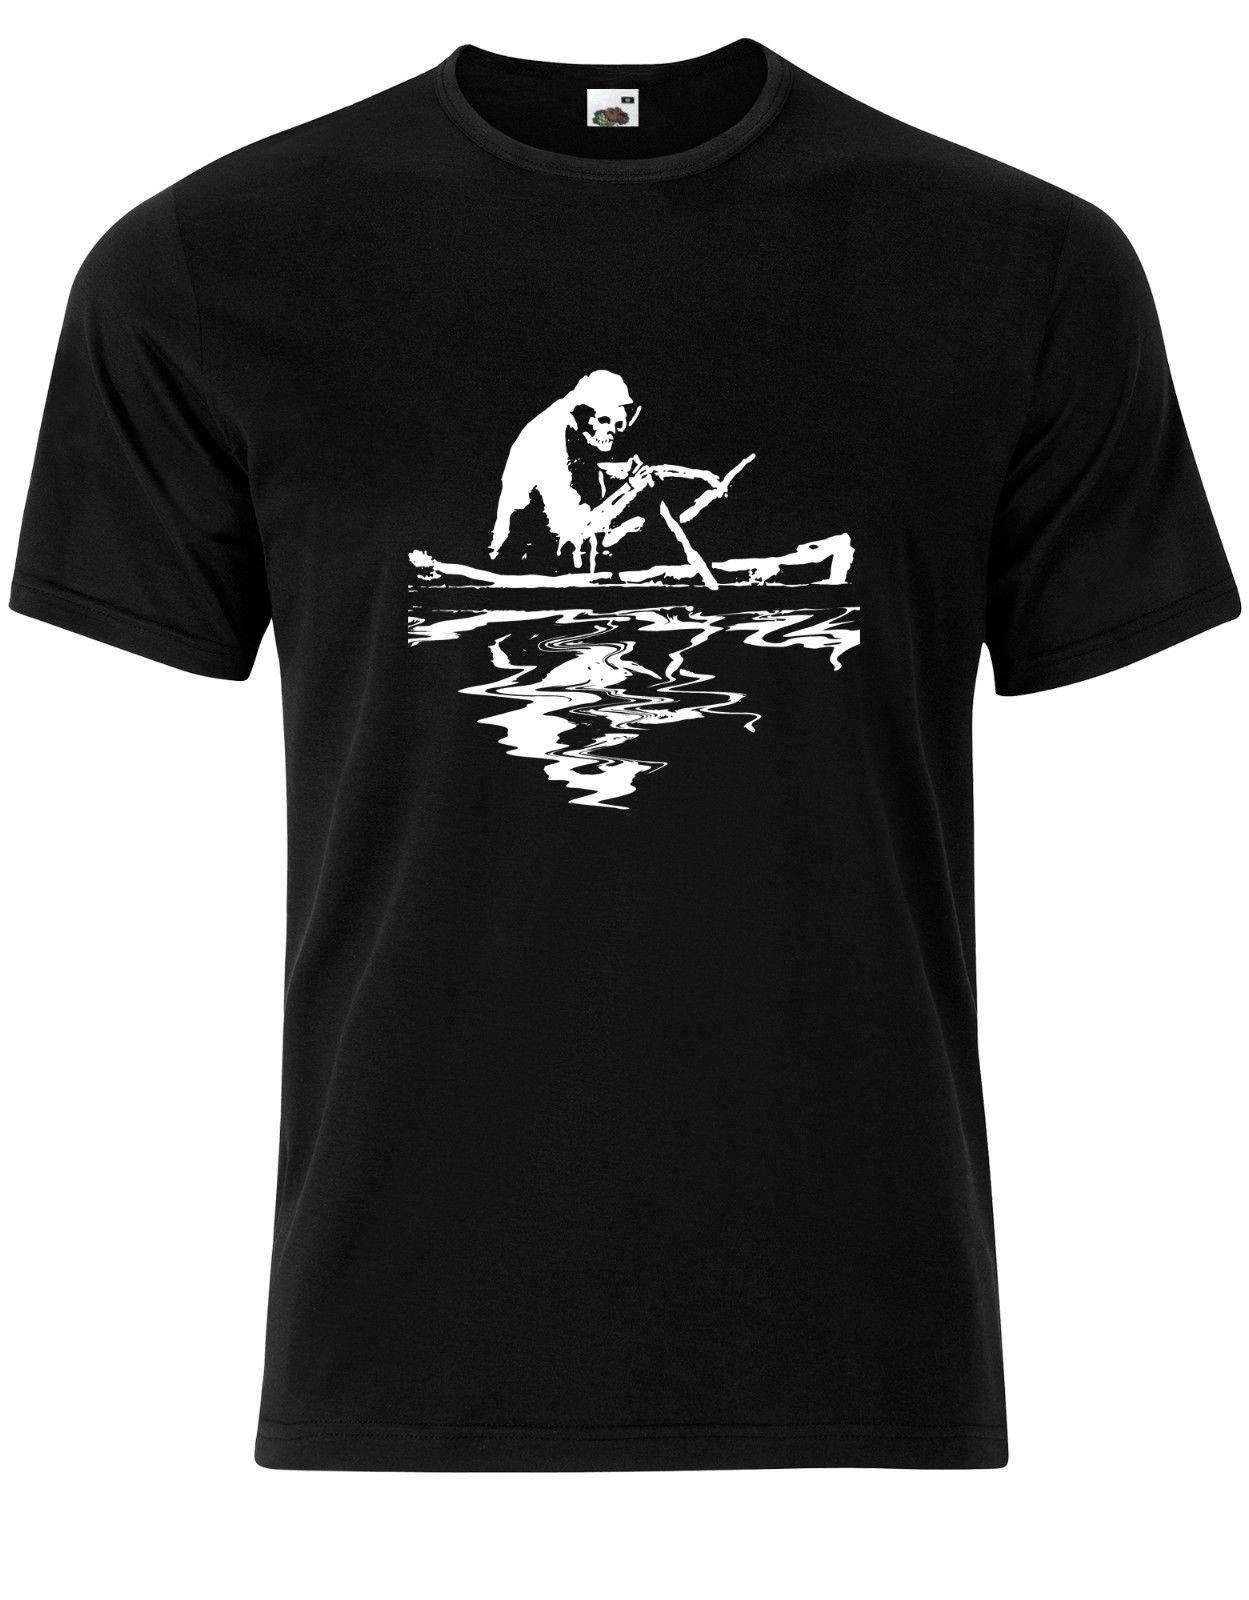 Banksy Graffiti The Grim Art Men Women Long Short Sleeve Baseball T Shirt 1759